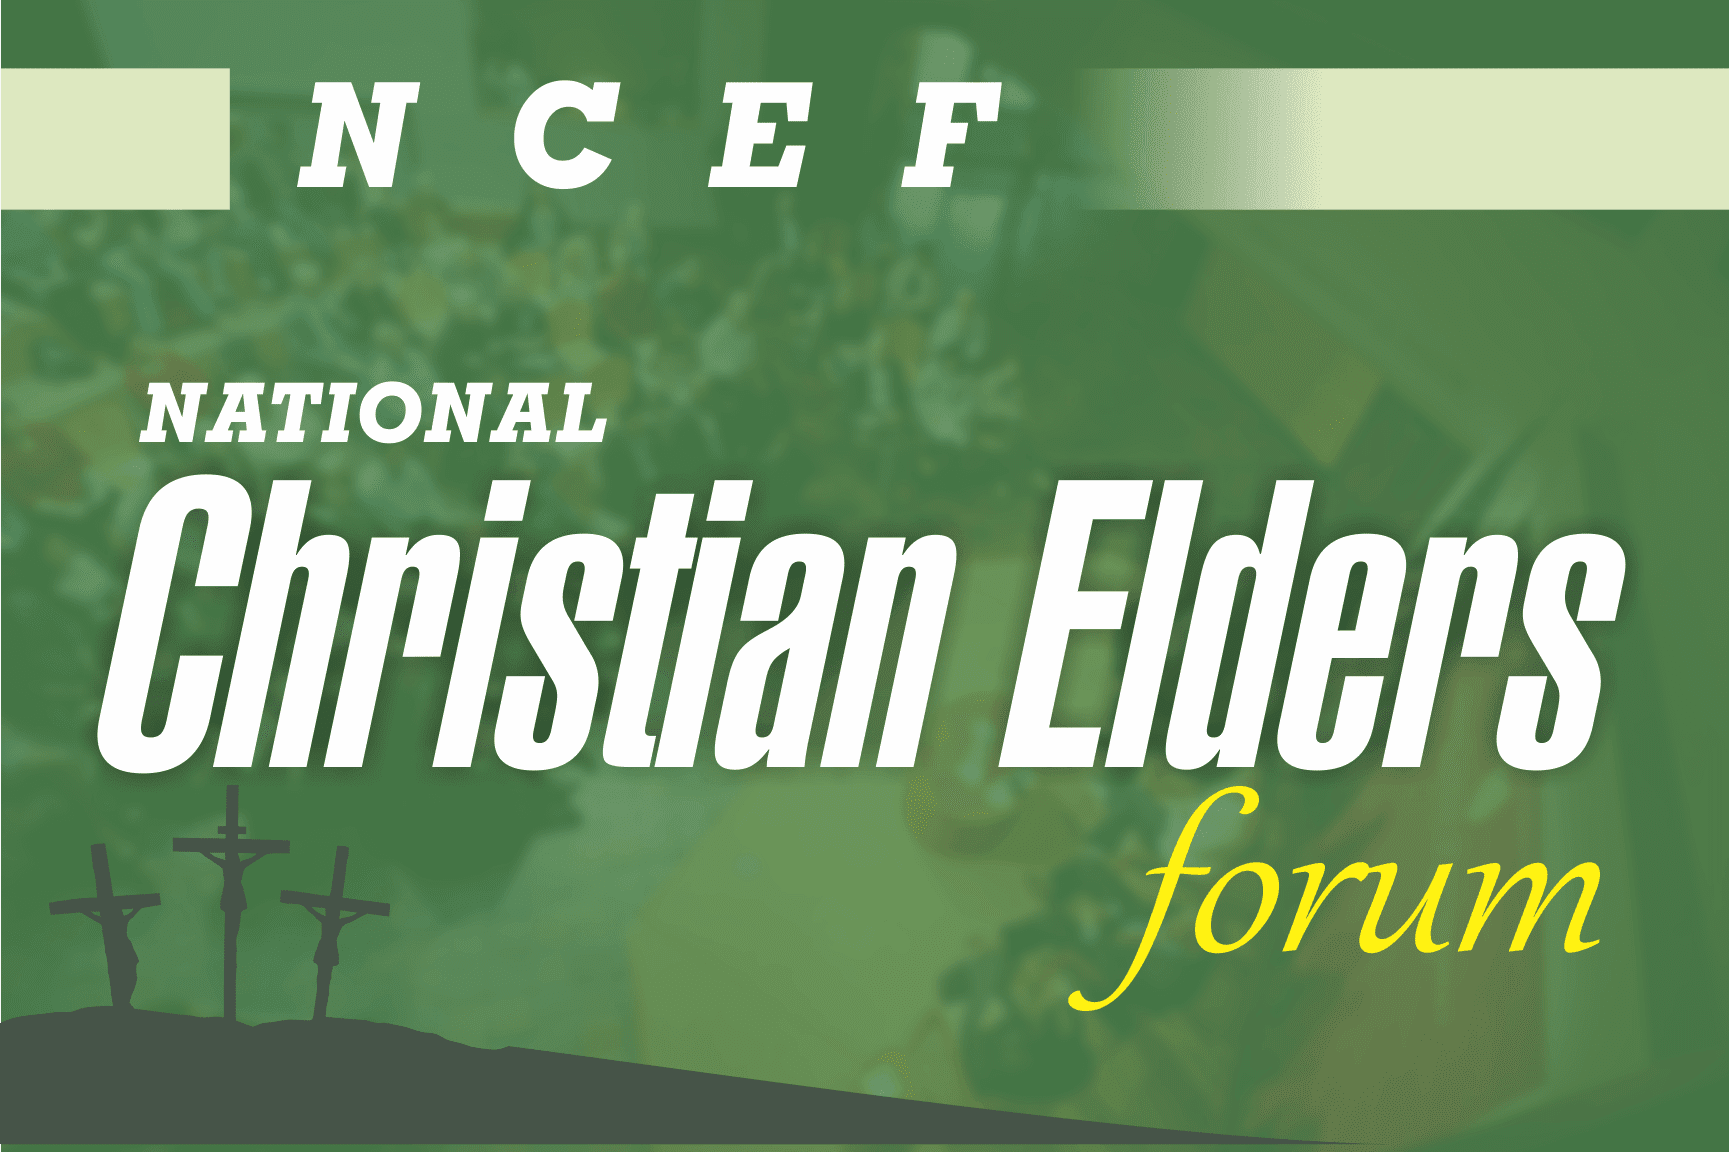 National Christian Elders Forum